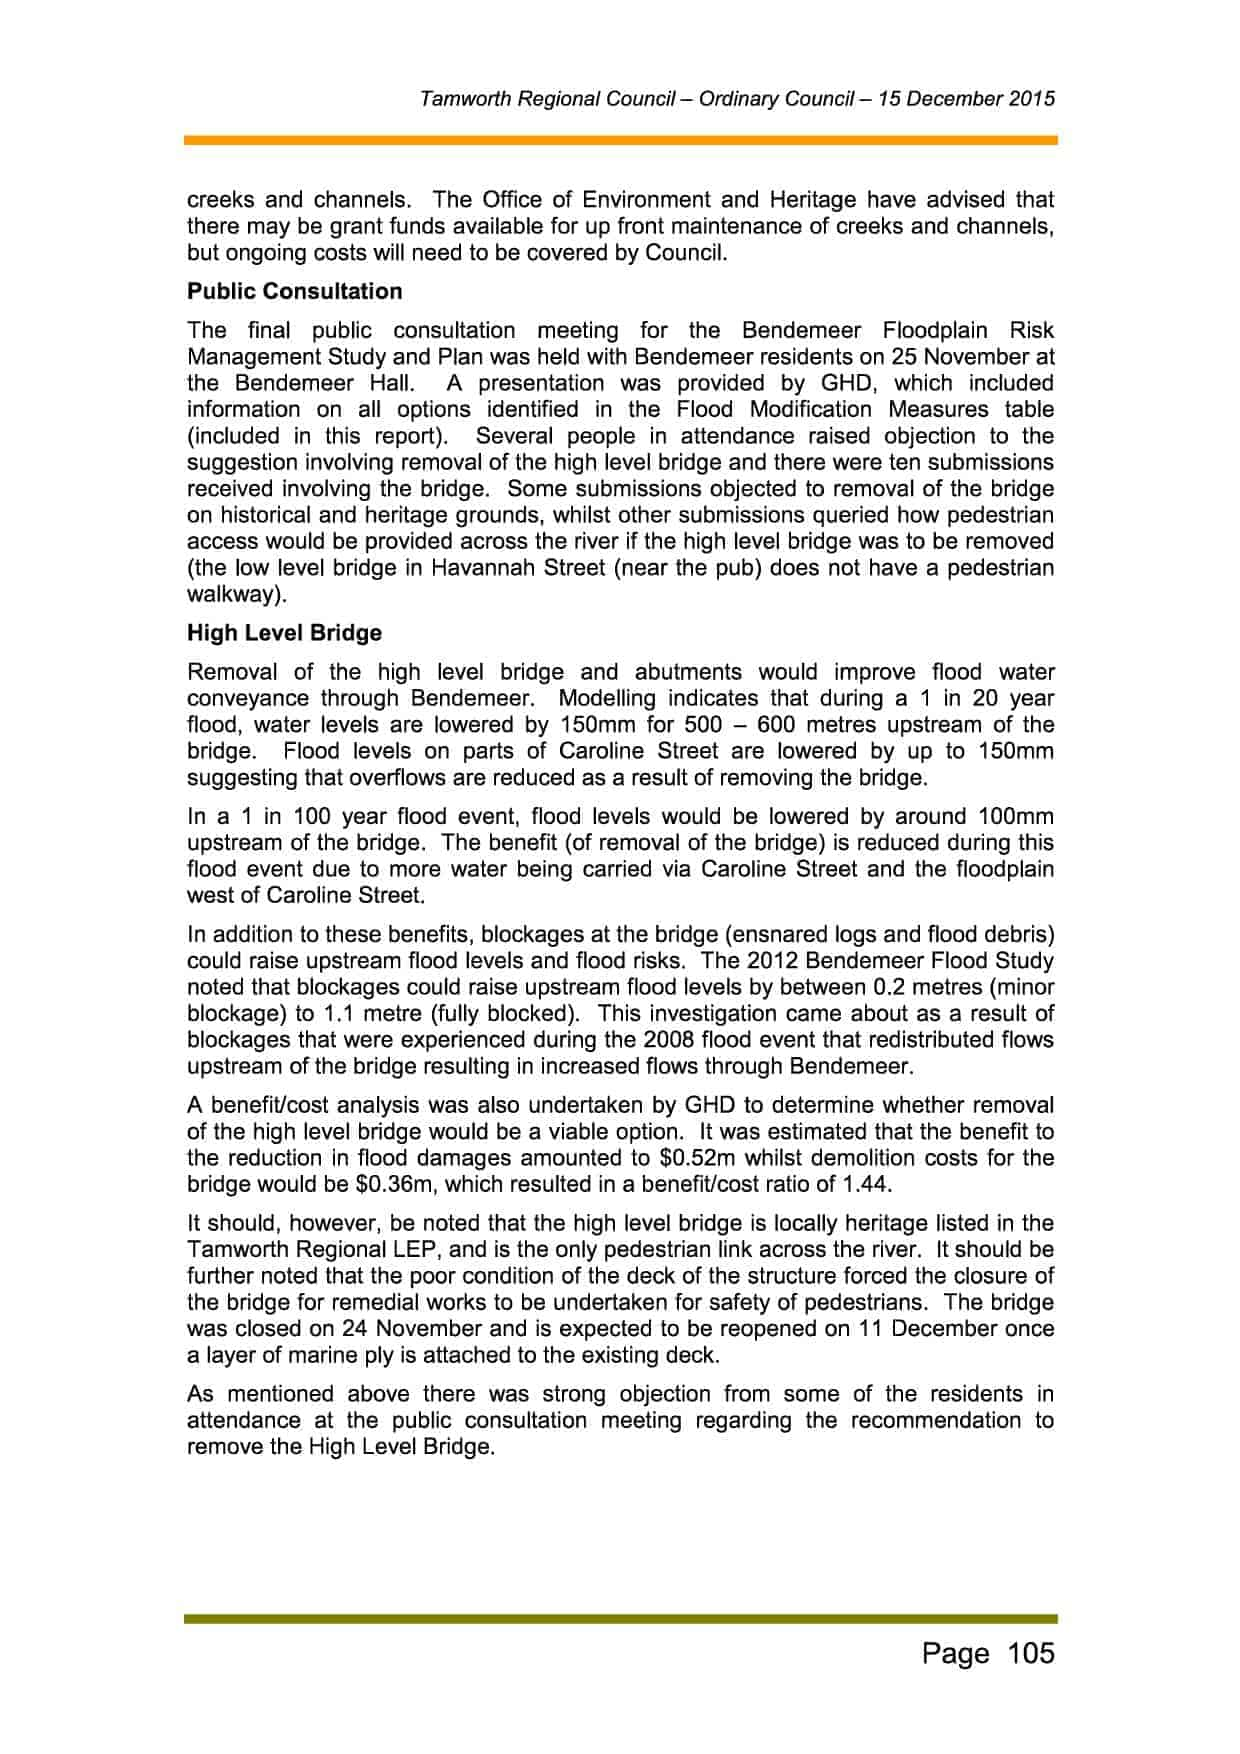 OPEN Business Paper - Ordinary Council 15 December 2015 (1)6